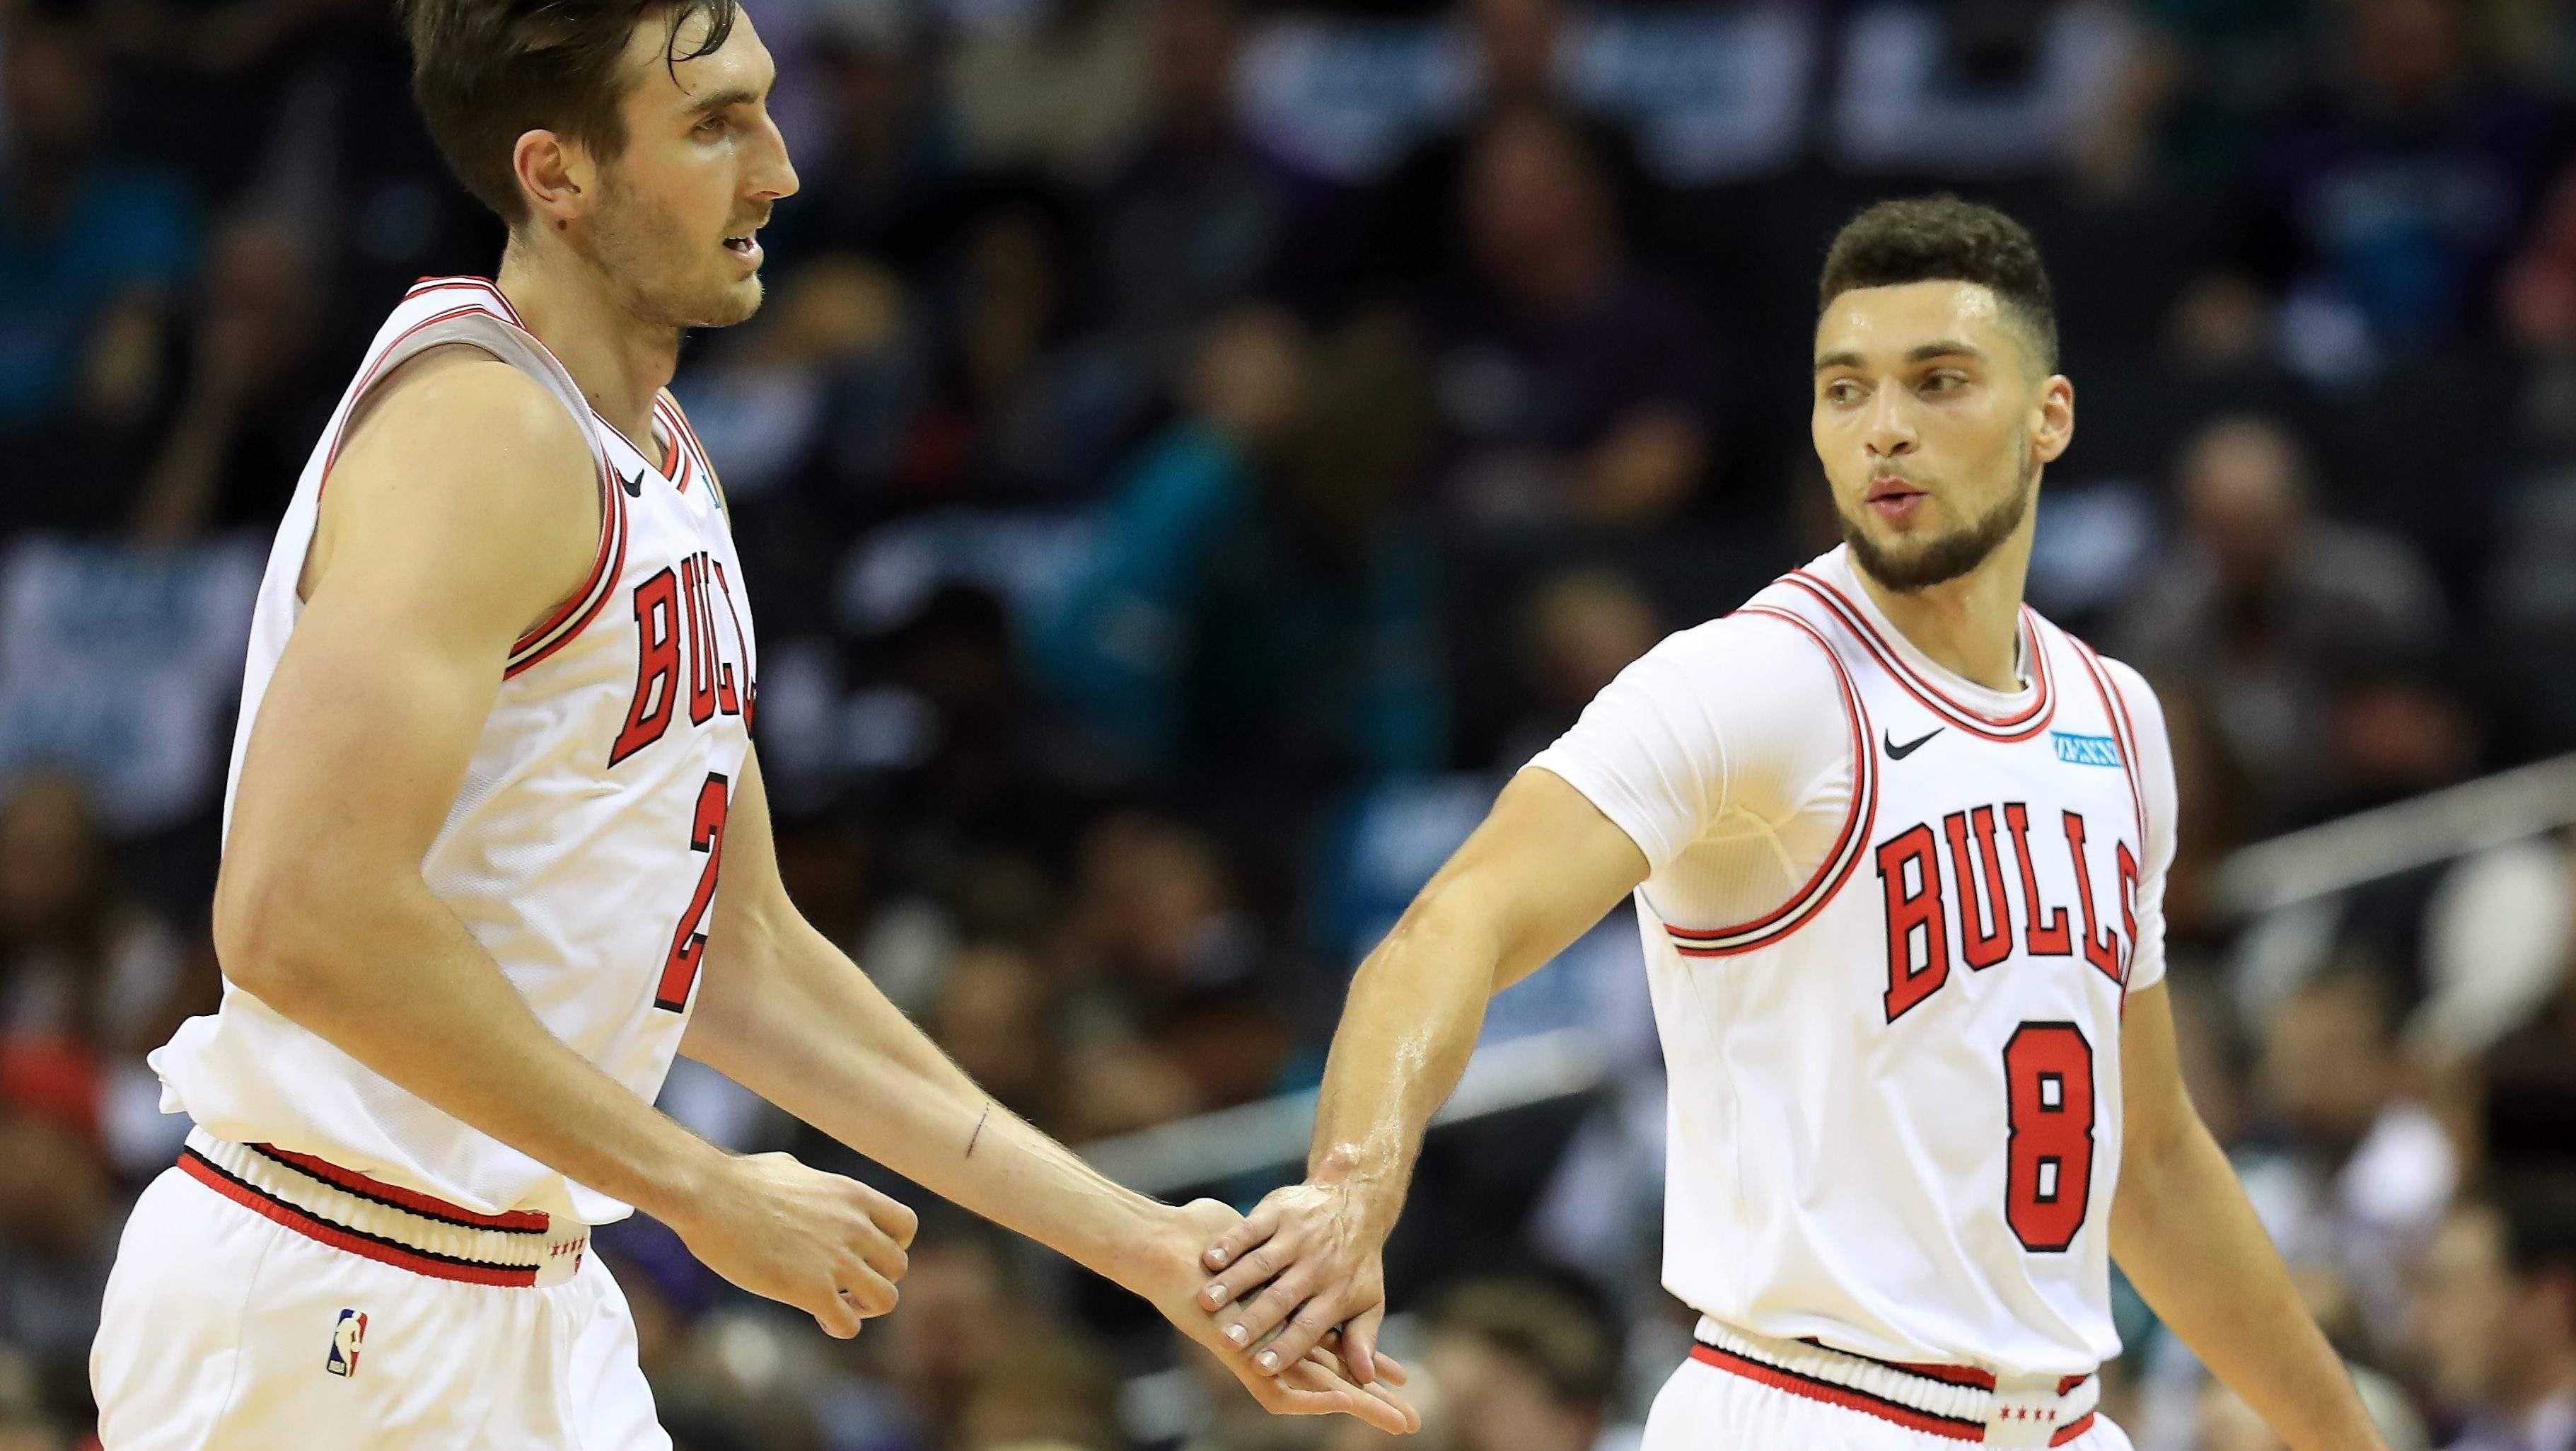 Bulls vs Grizzlies Live Stream How to Watch Online